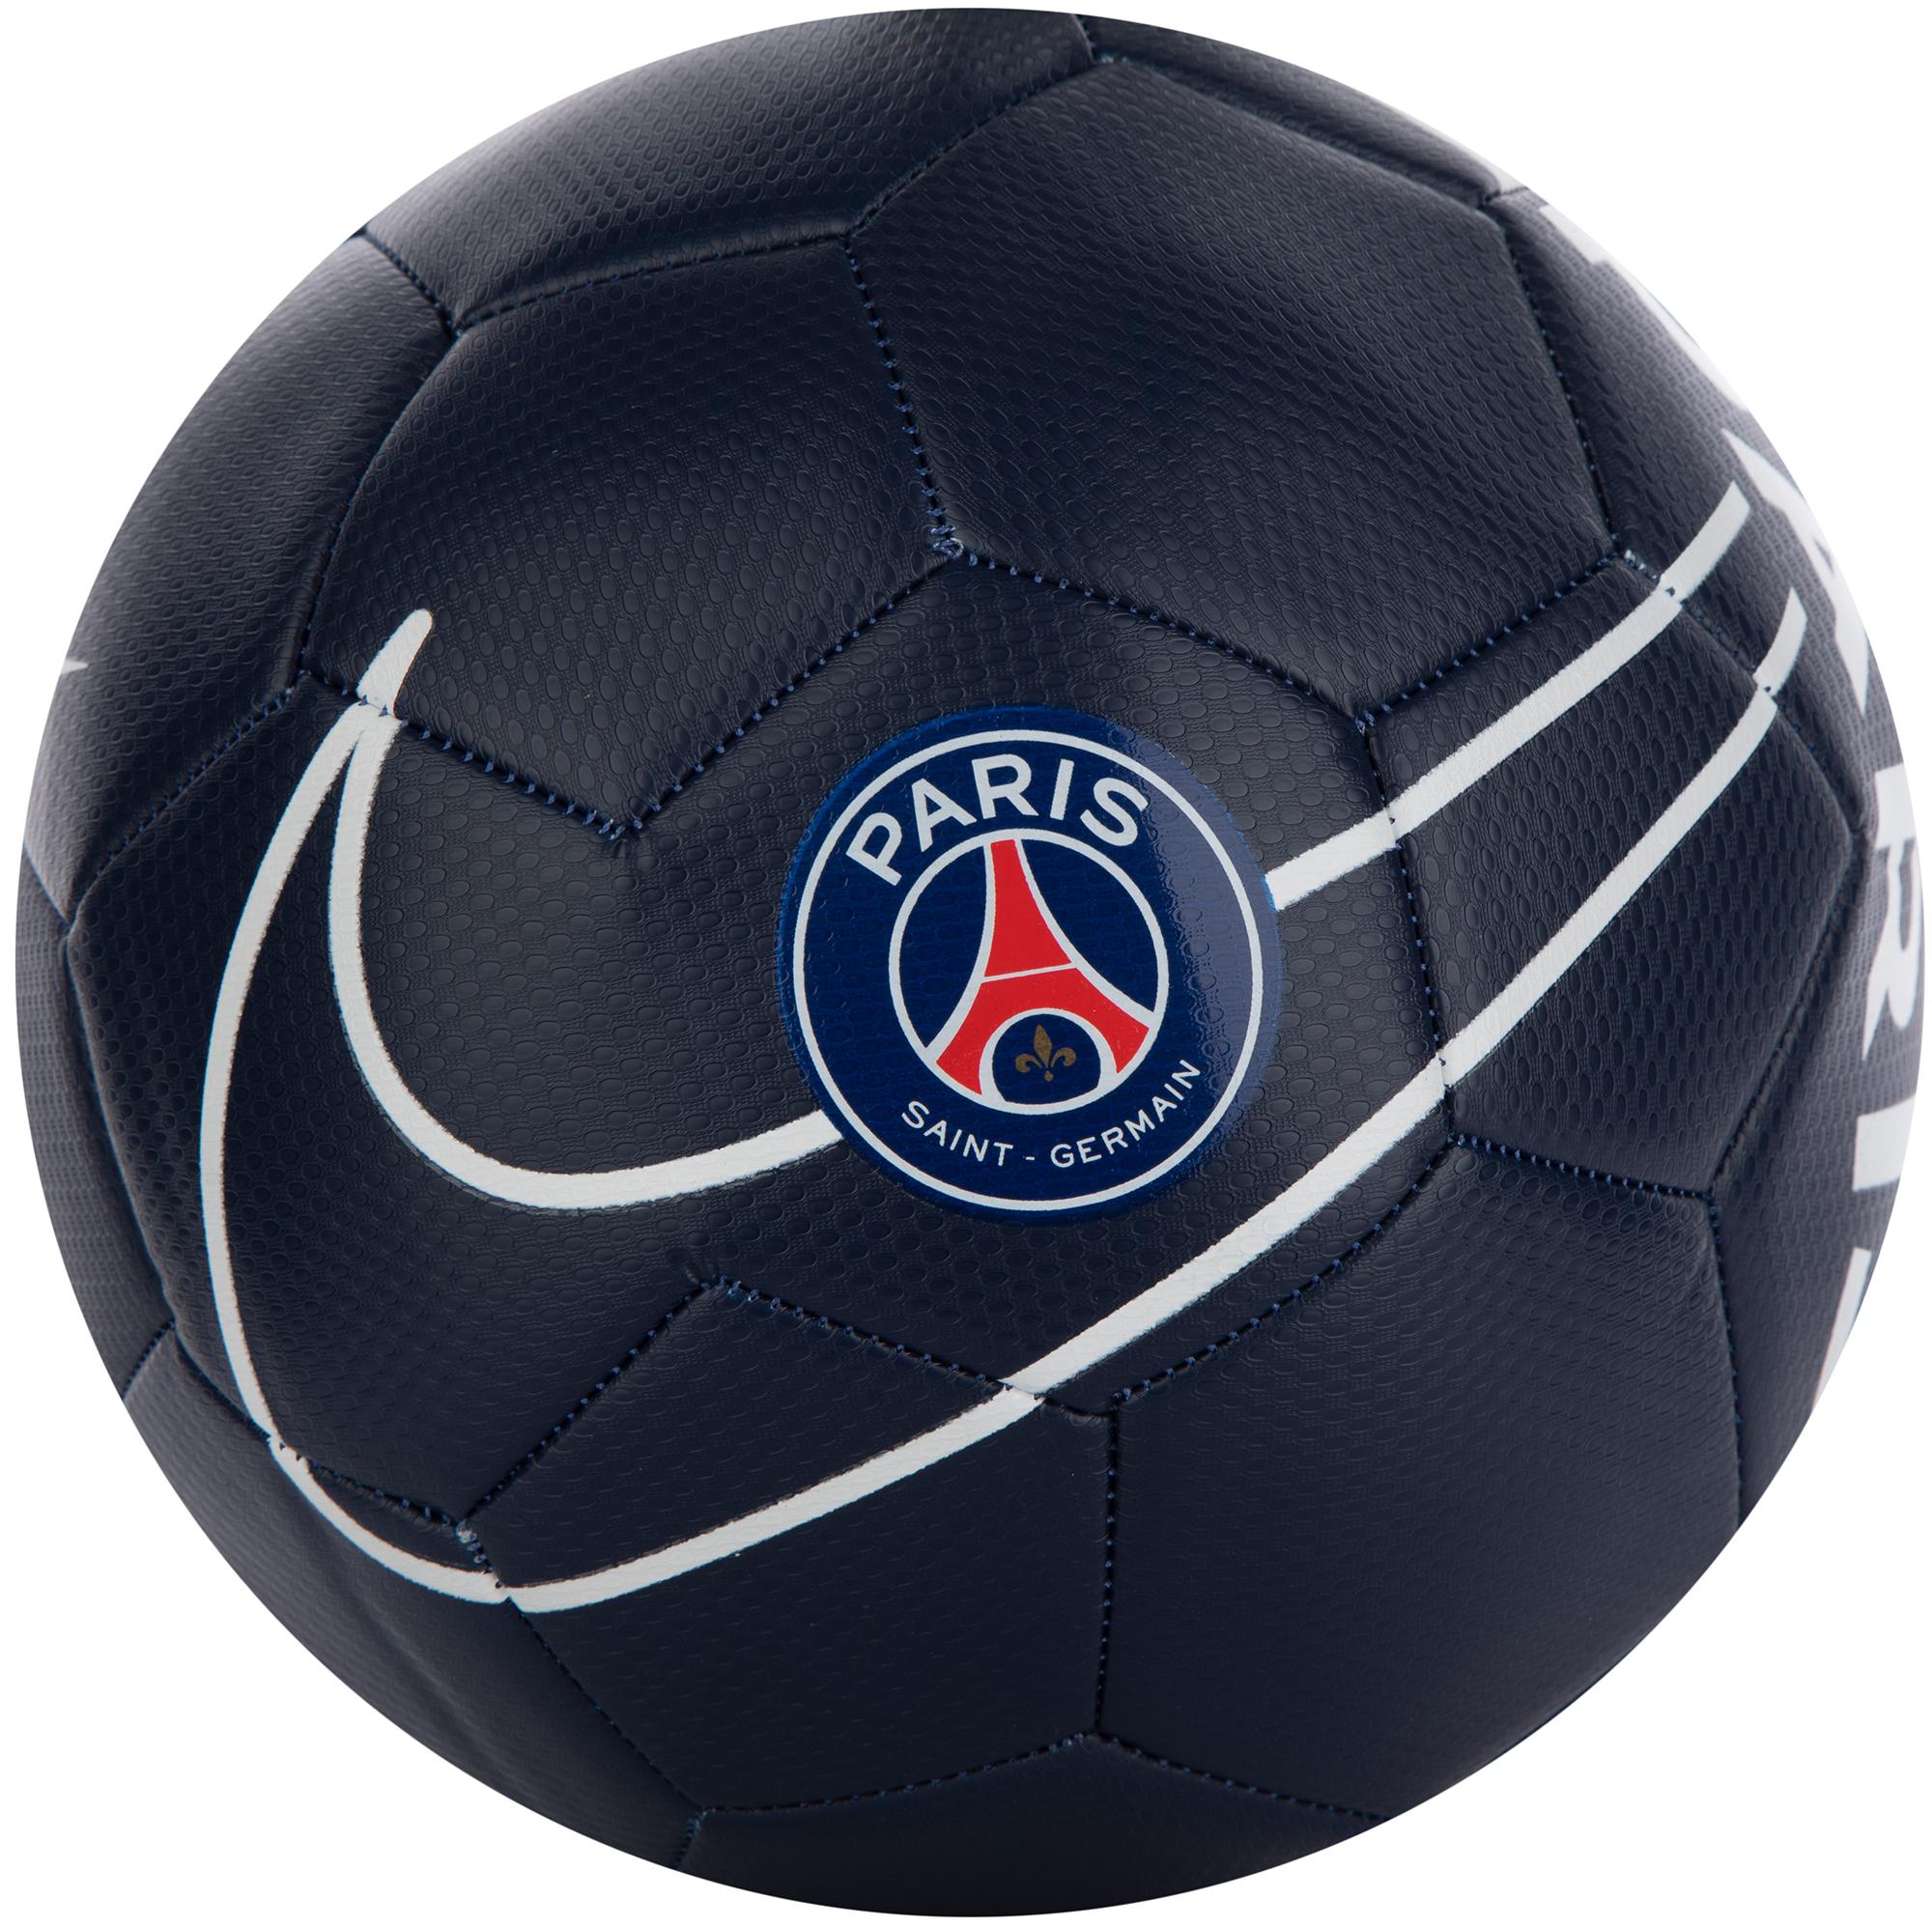 Nike Мяч футбольный PSG Prestige